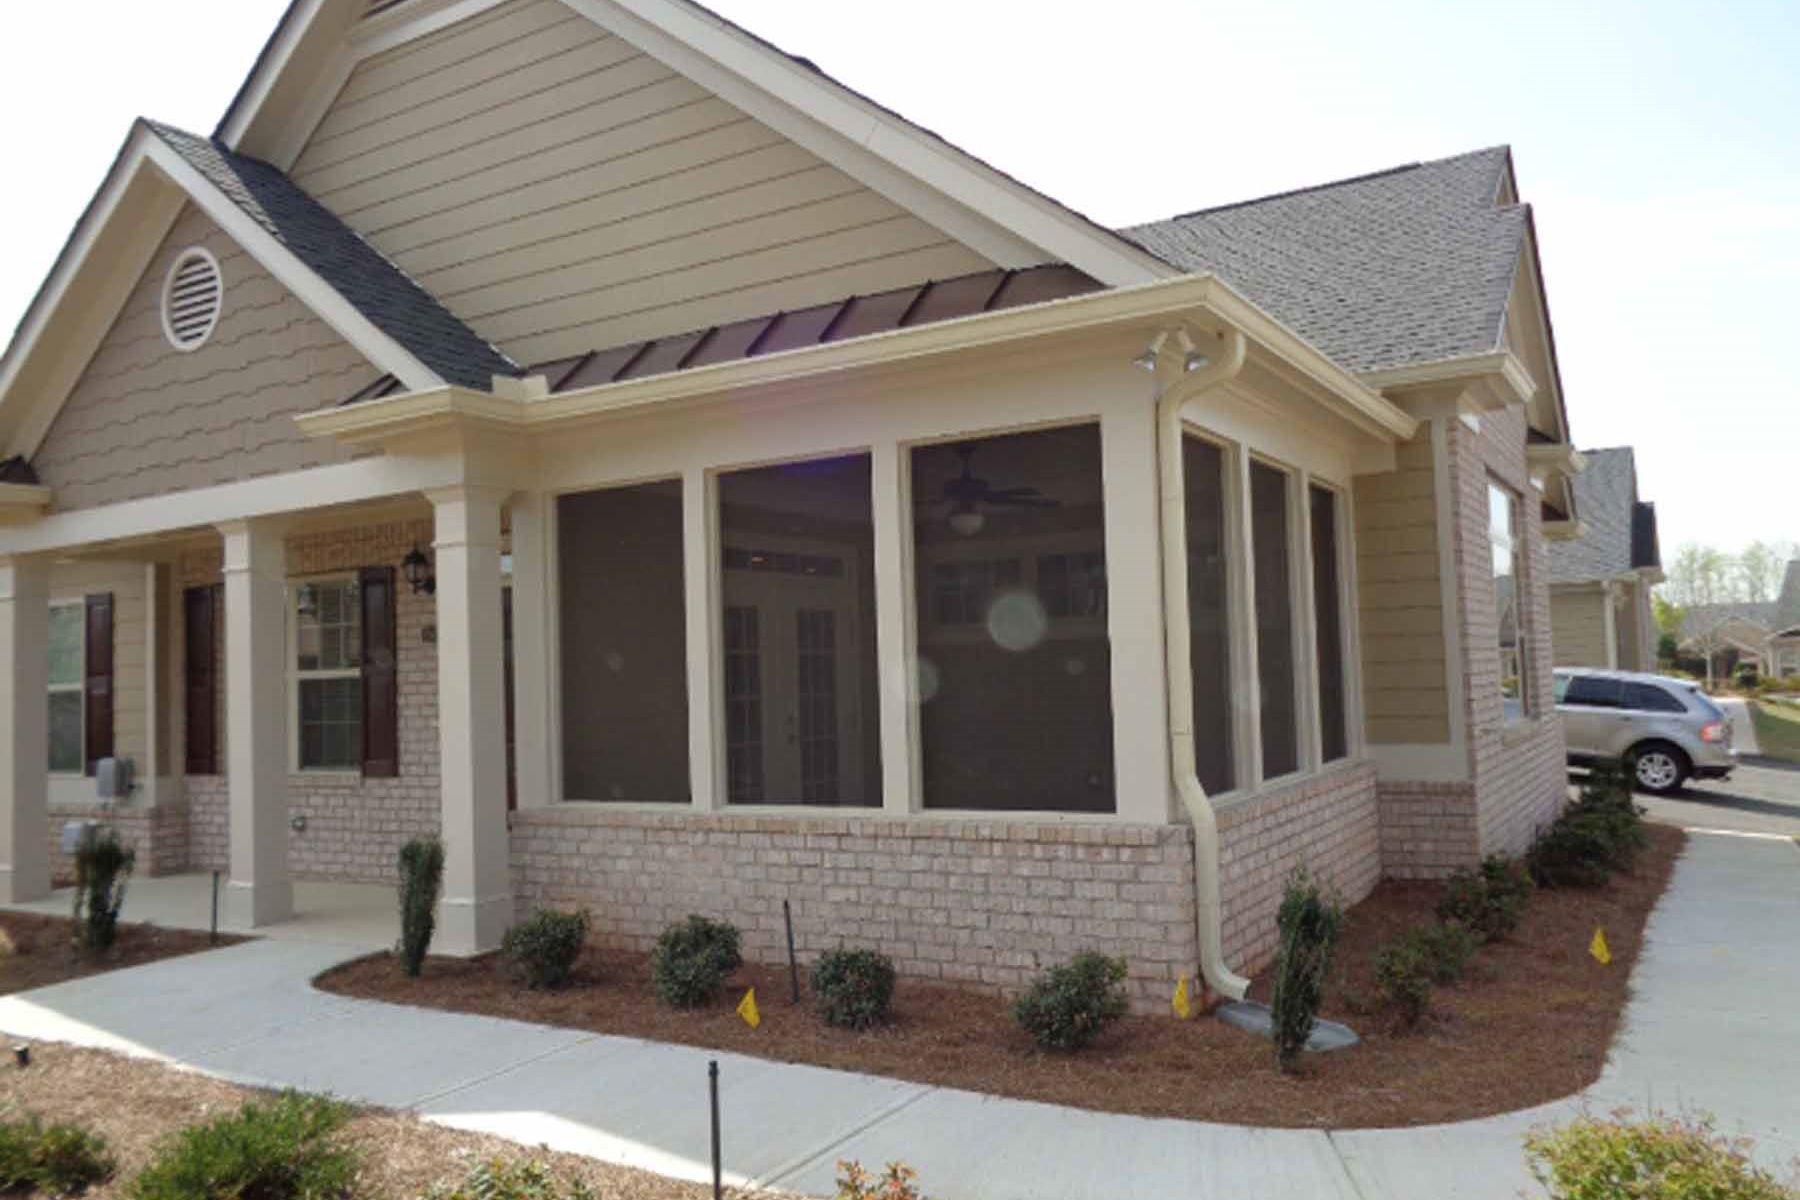 Condominium for Rent at Rare Rental Opportunity 206 Orchards Circle Woodstock, Georgia 30188 United States